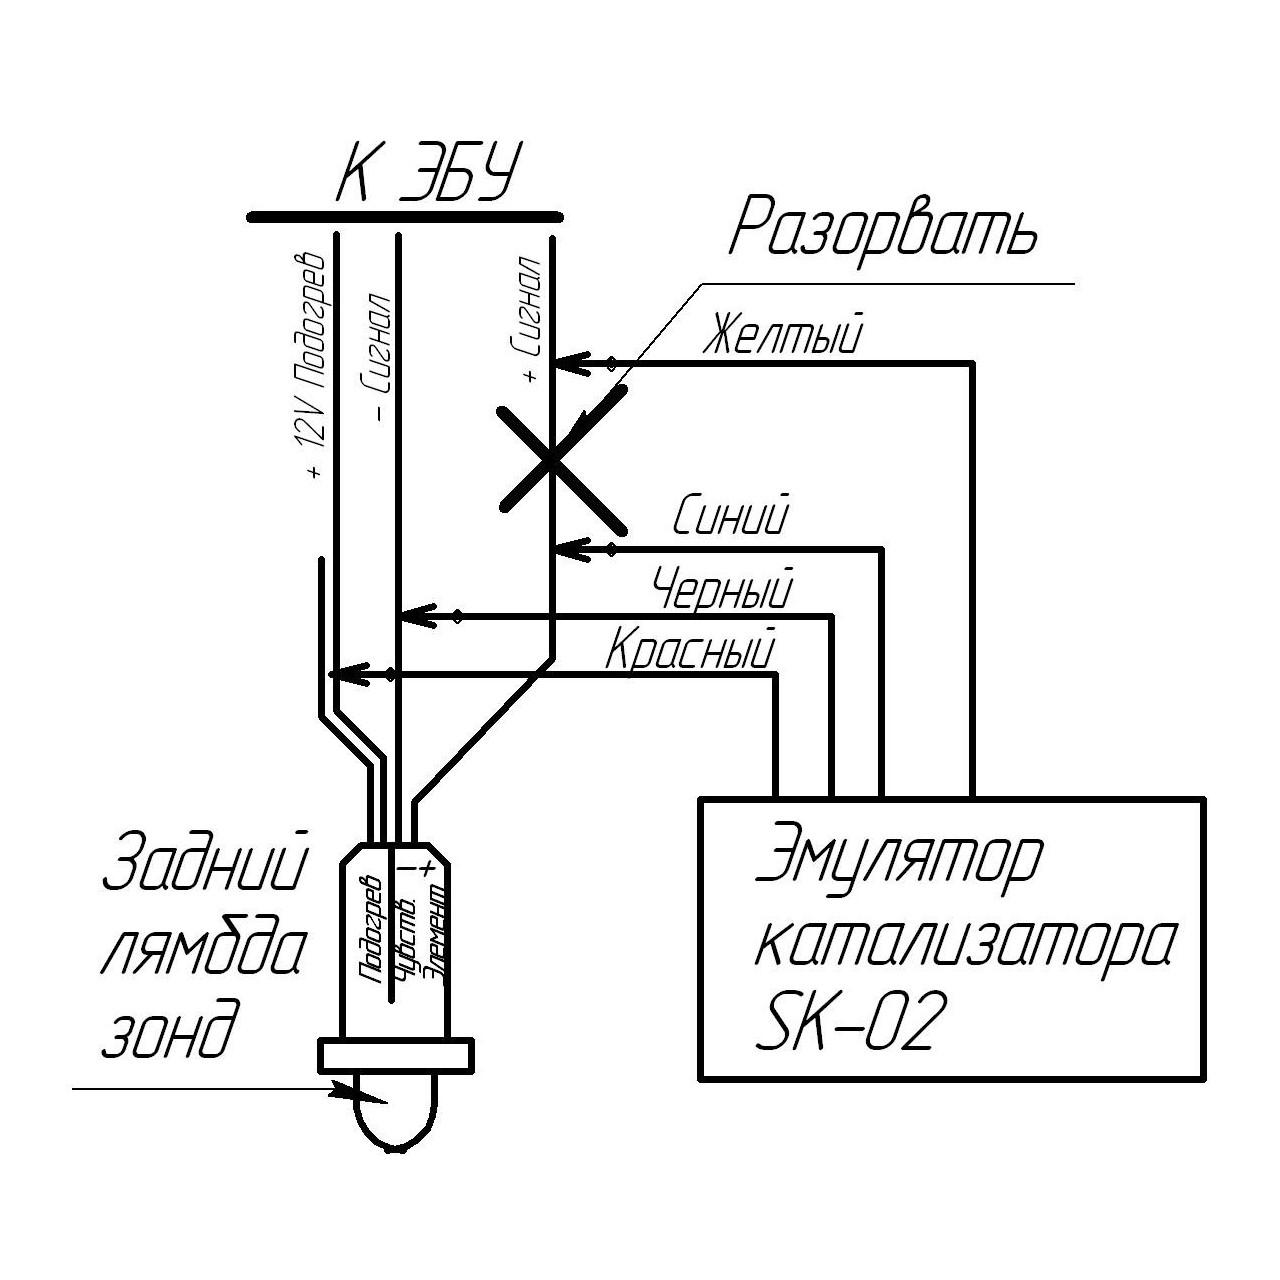 buy emulator catalyst and oxygen sensor with warranty Durango O2 Sensor Wiring Diagram lambda emulator and catalyst off dtc p0420 error